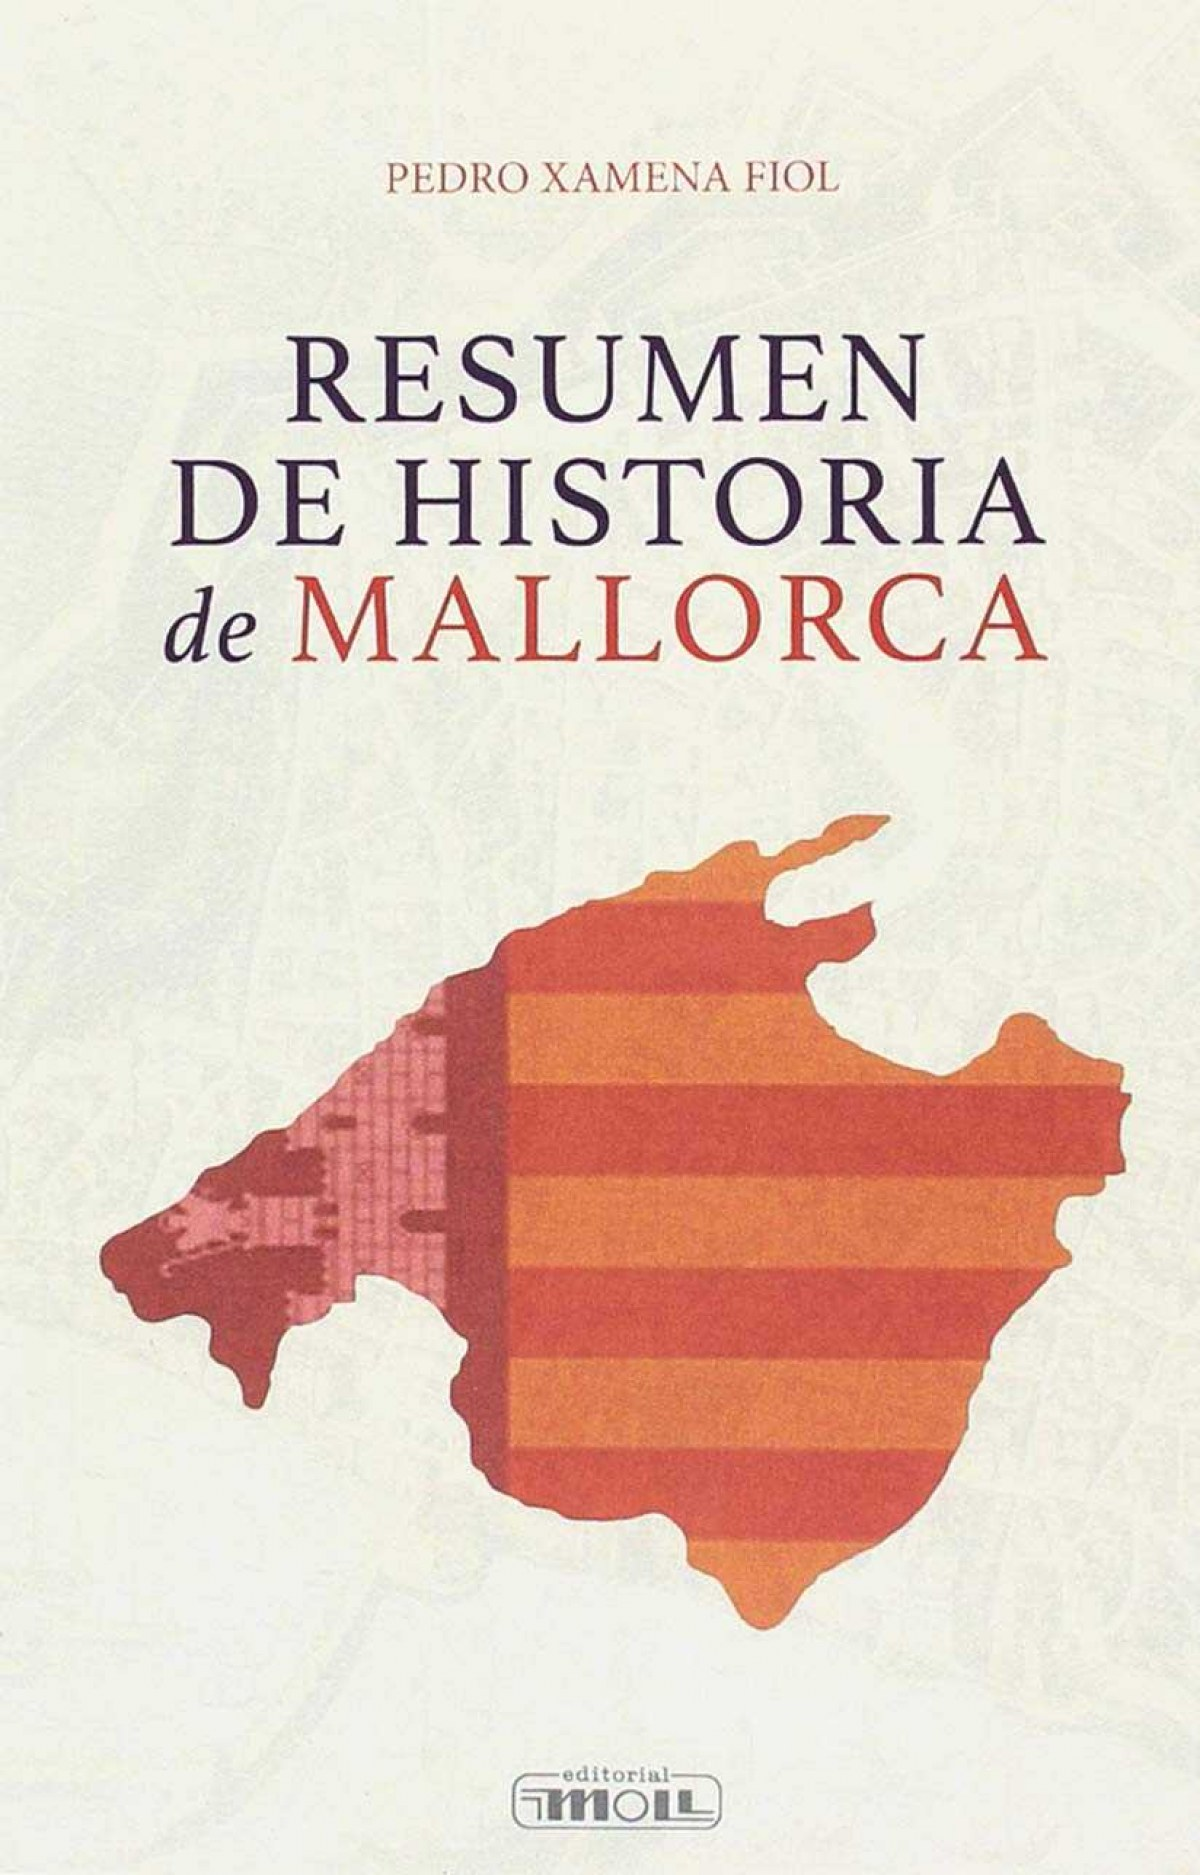 RESUMEN DE HISTORIA DE MALLORCA 9788427315068